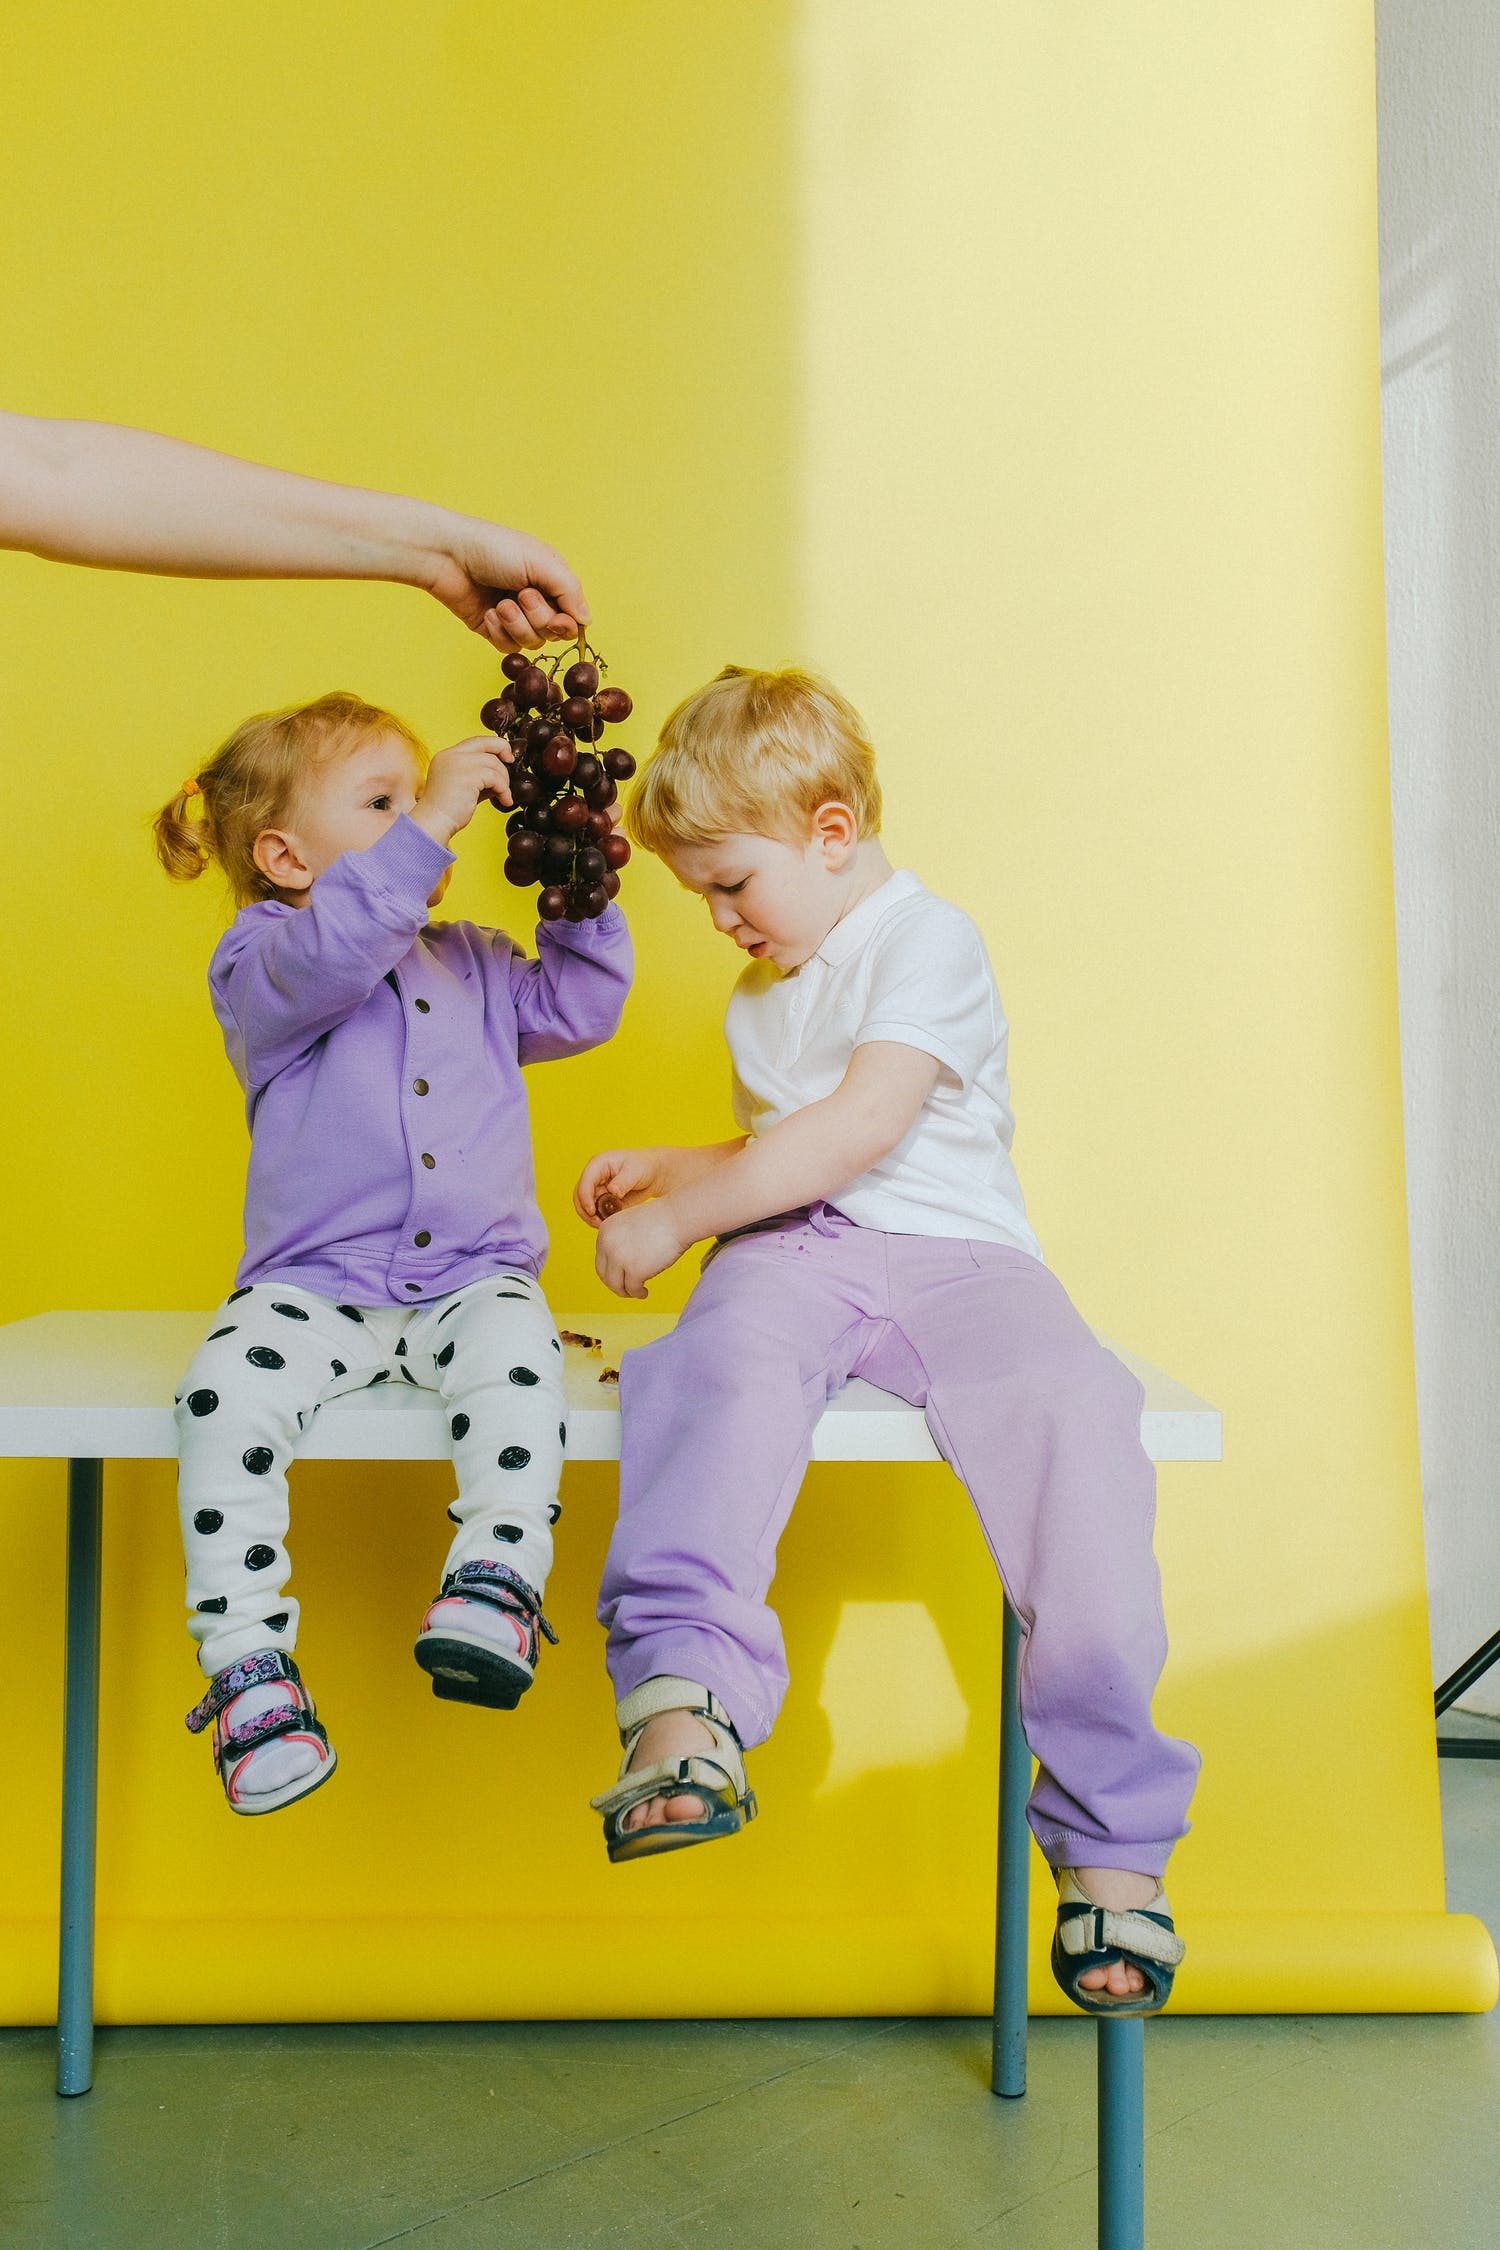 First Birthday Ideas   Take Some fun Photos Together   Beanstalk Mums